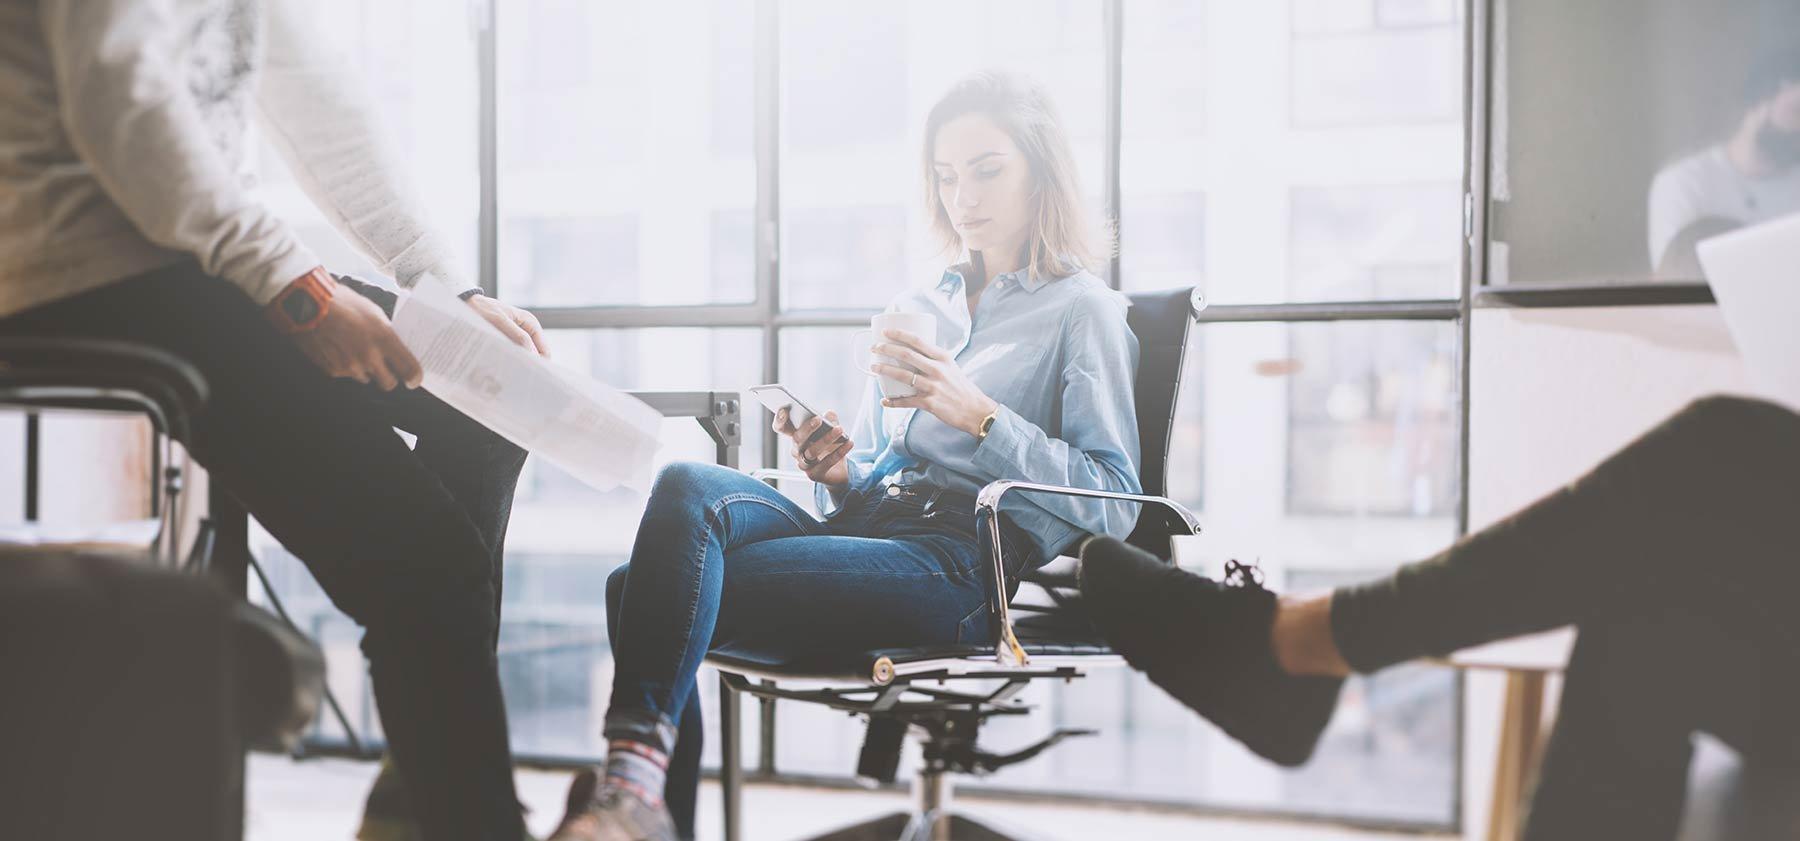 Agile Digital Marketing - What We Do